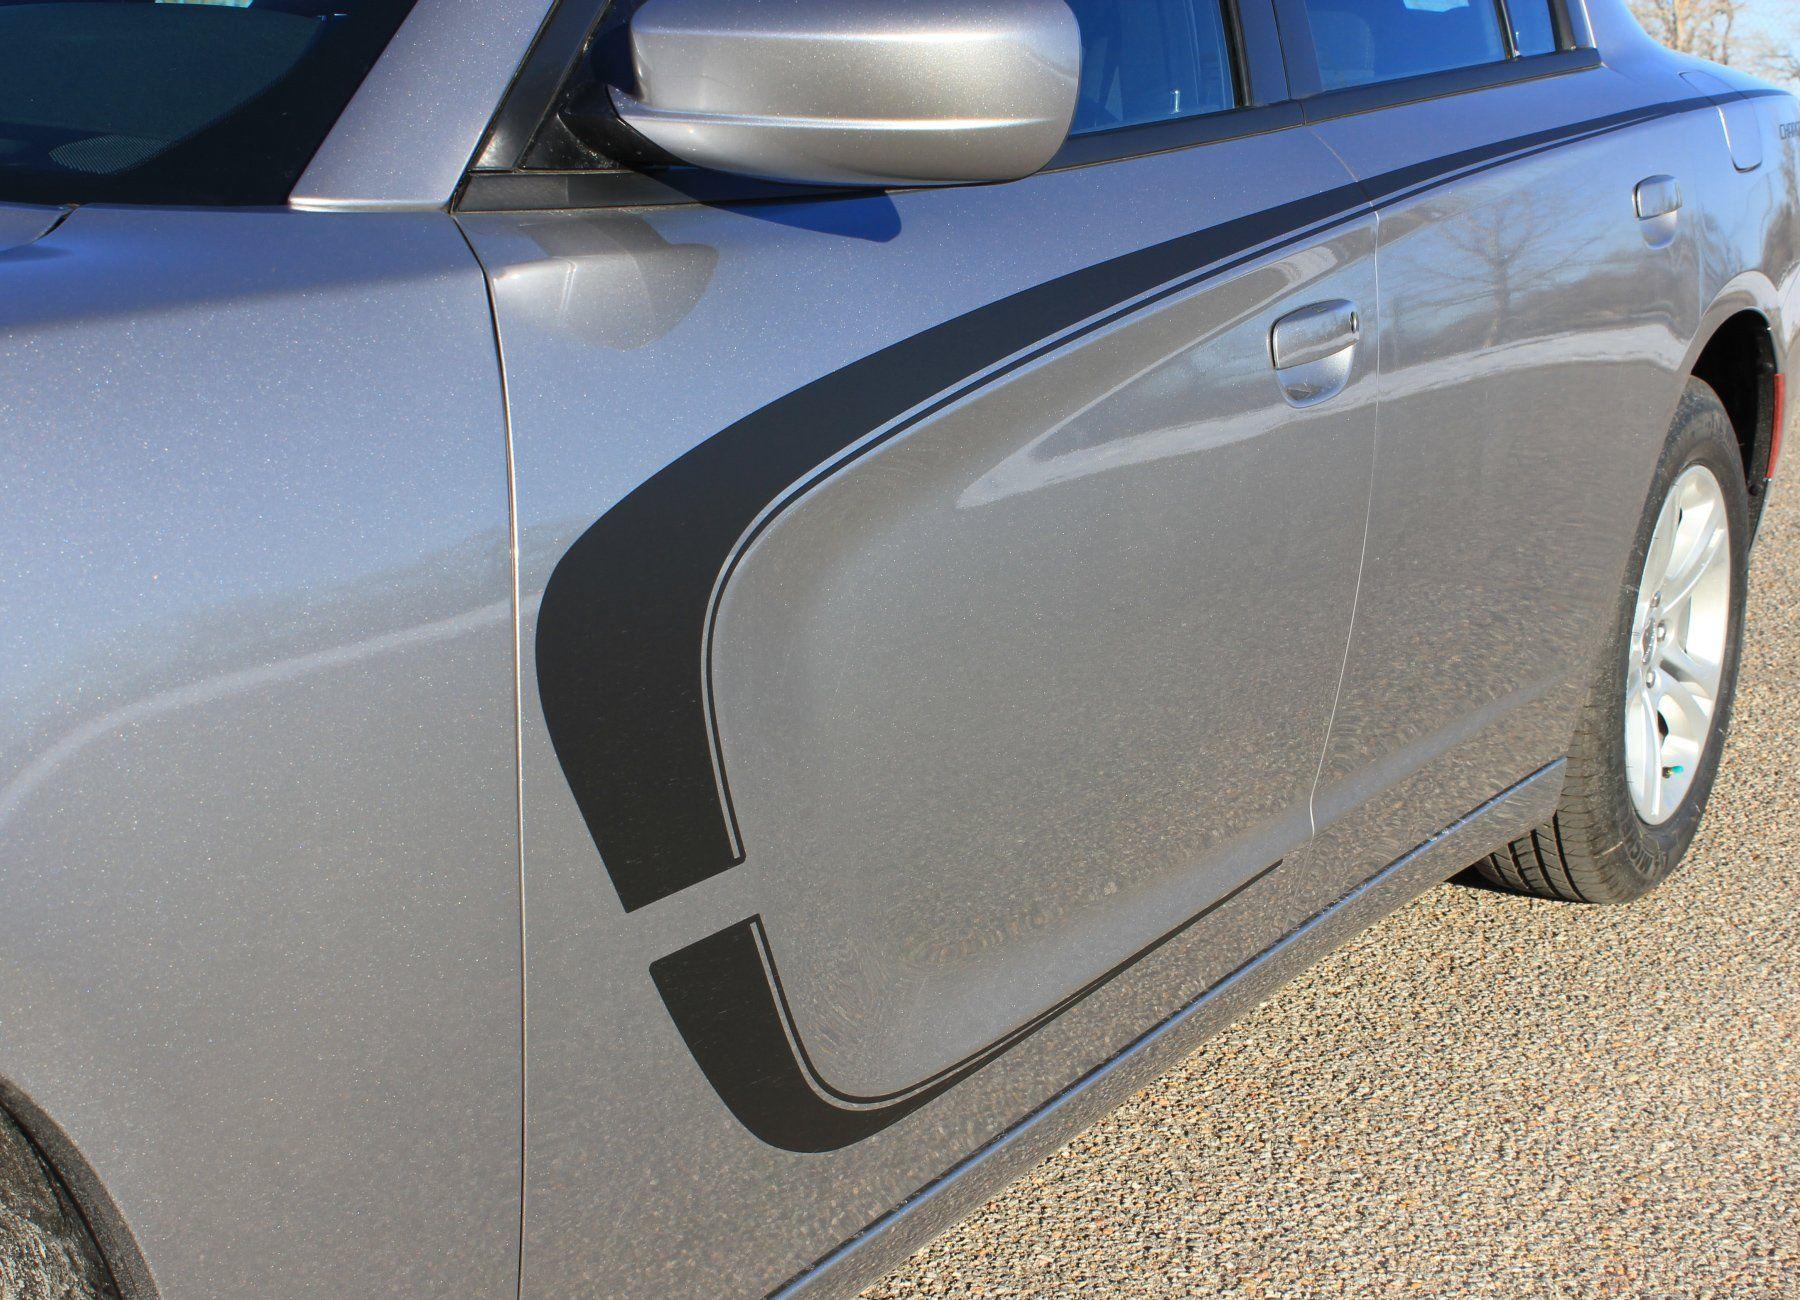 Hood Sides C-STRIPE COMBO Decals Stripes Vinyl Graphics 2015-2019 Dodge Charger